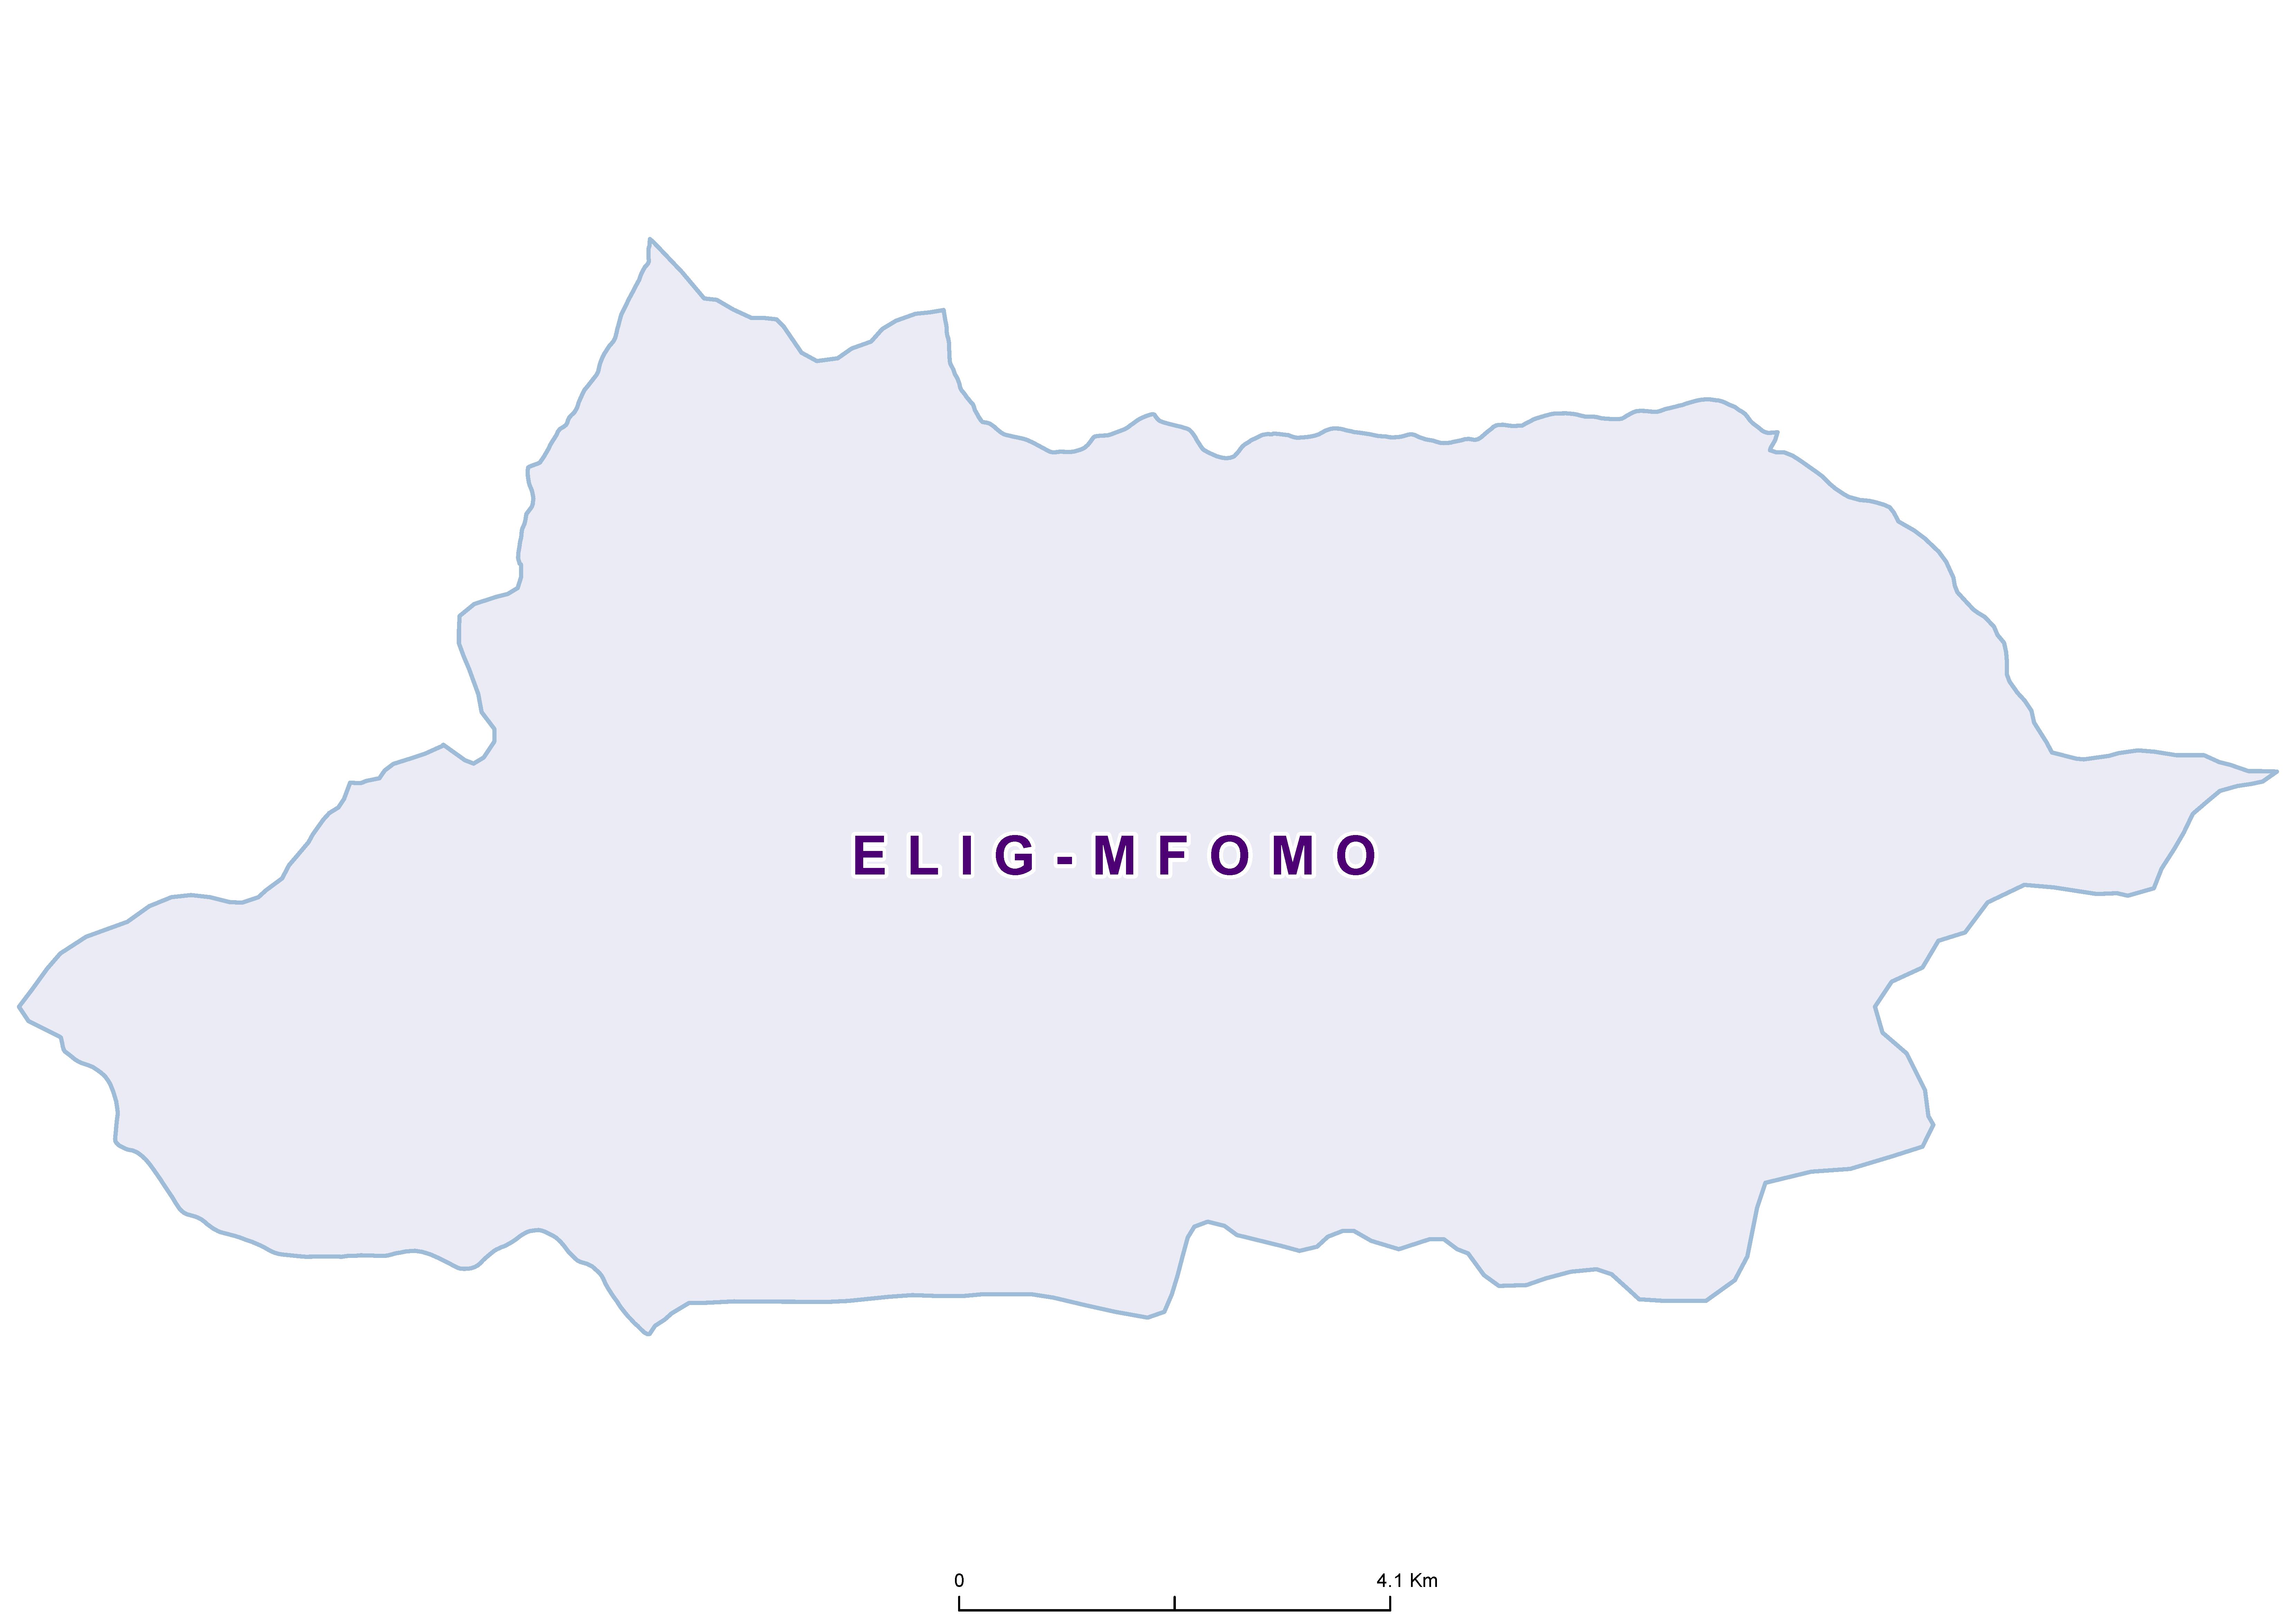 Elig-mfomo Mean SCH 20180001